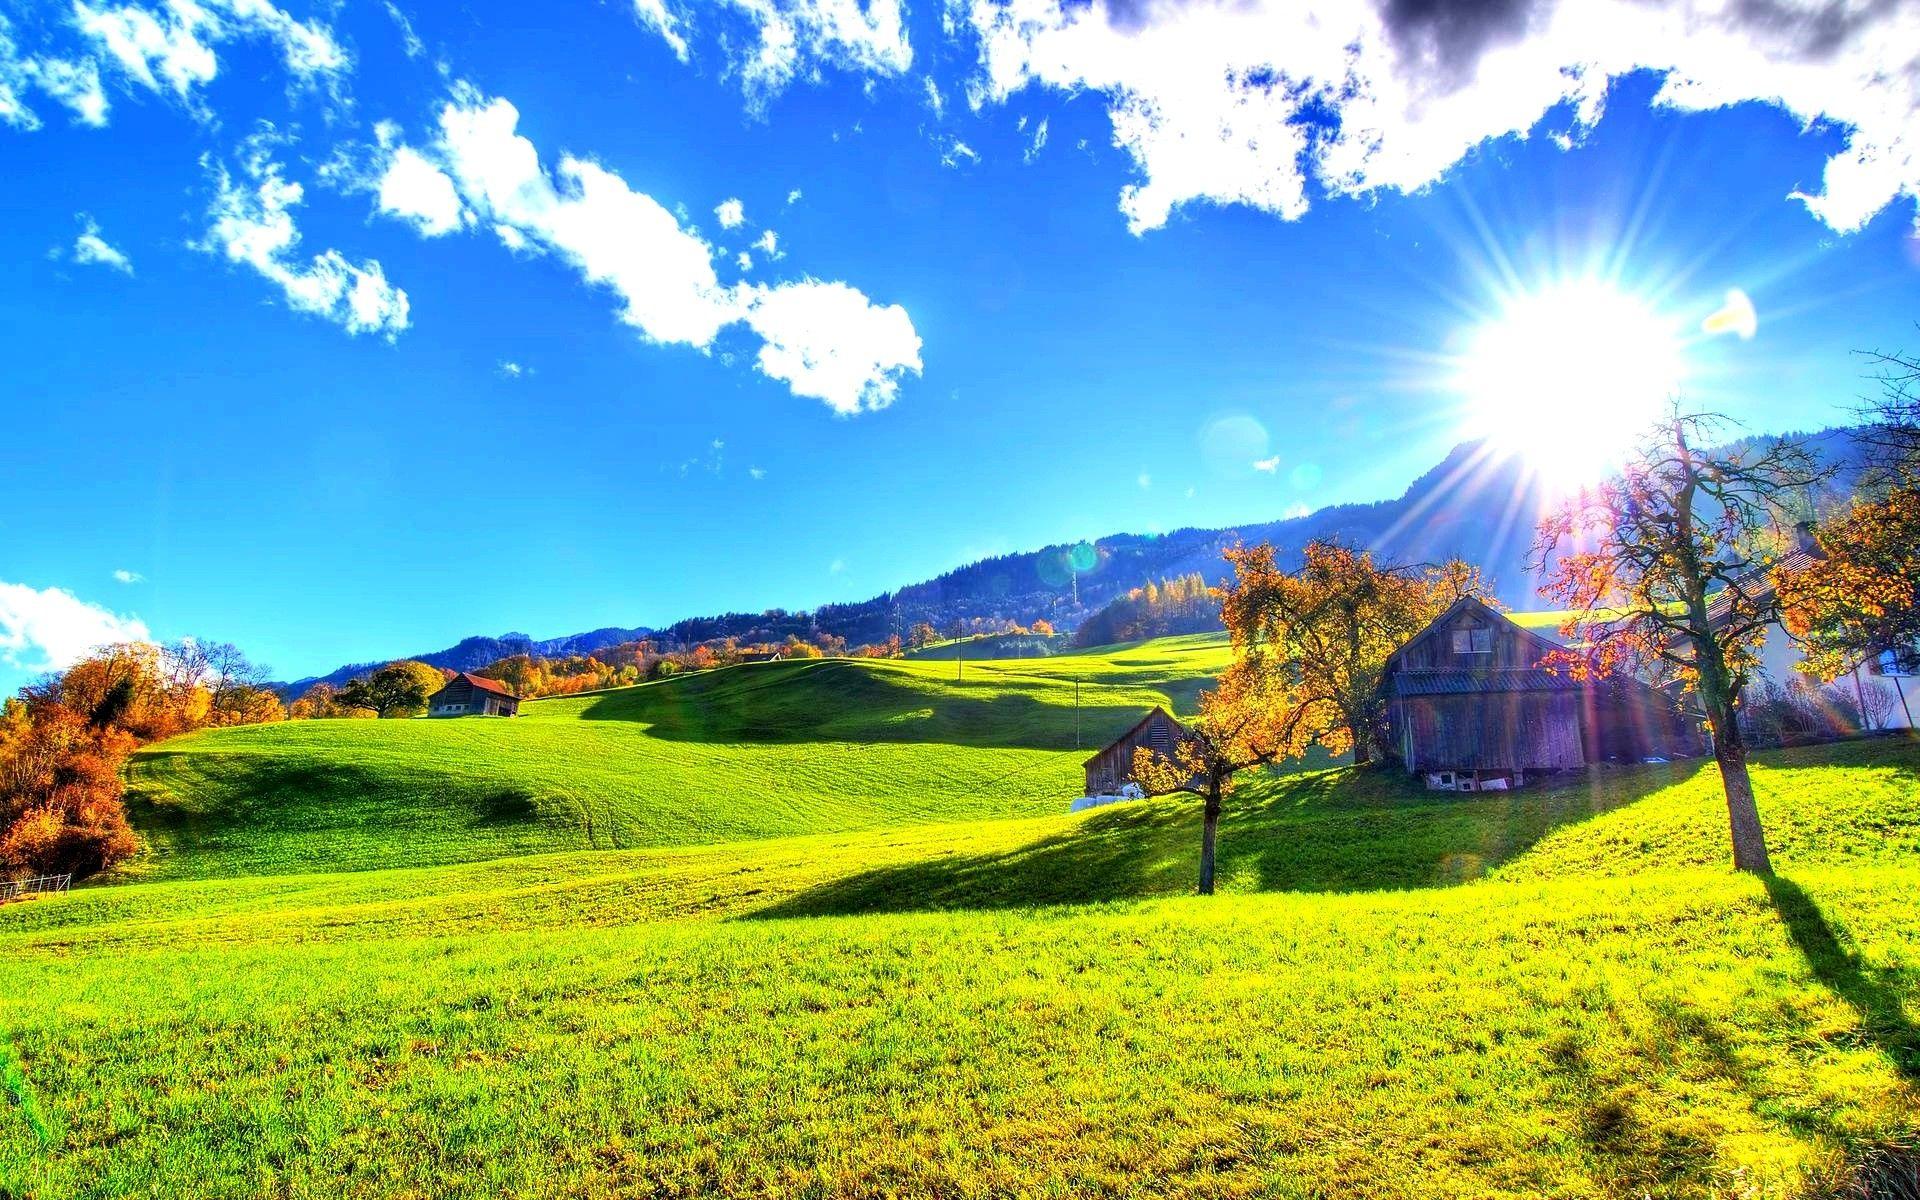 Beautiful Day Wallpaper - WallpaperSafari  |Sunny Beautiful Day